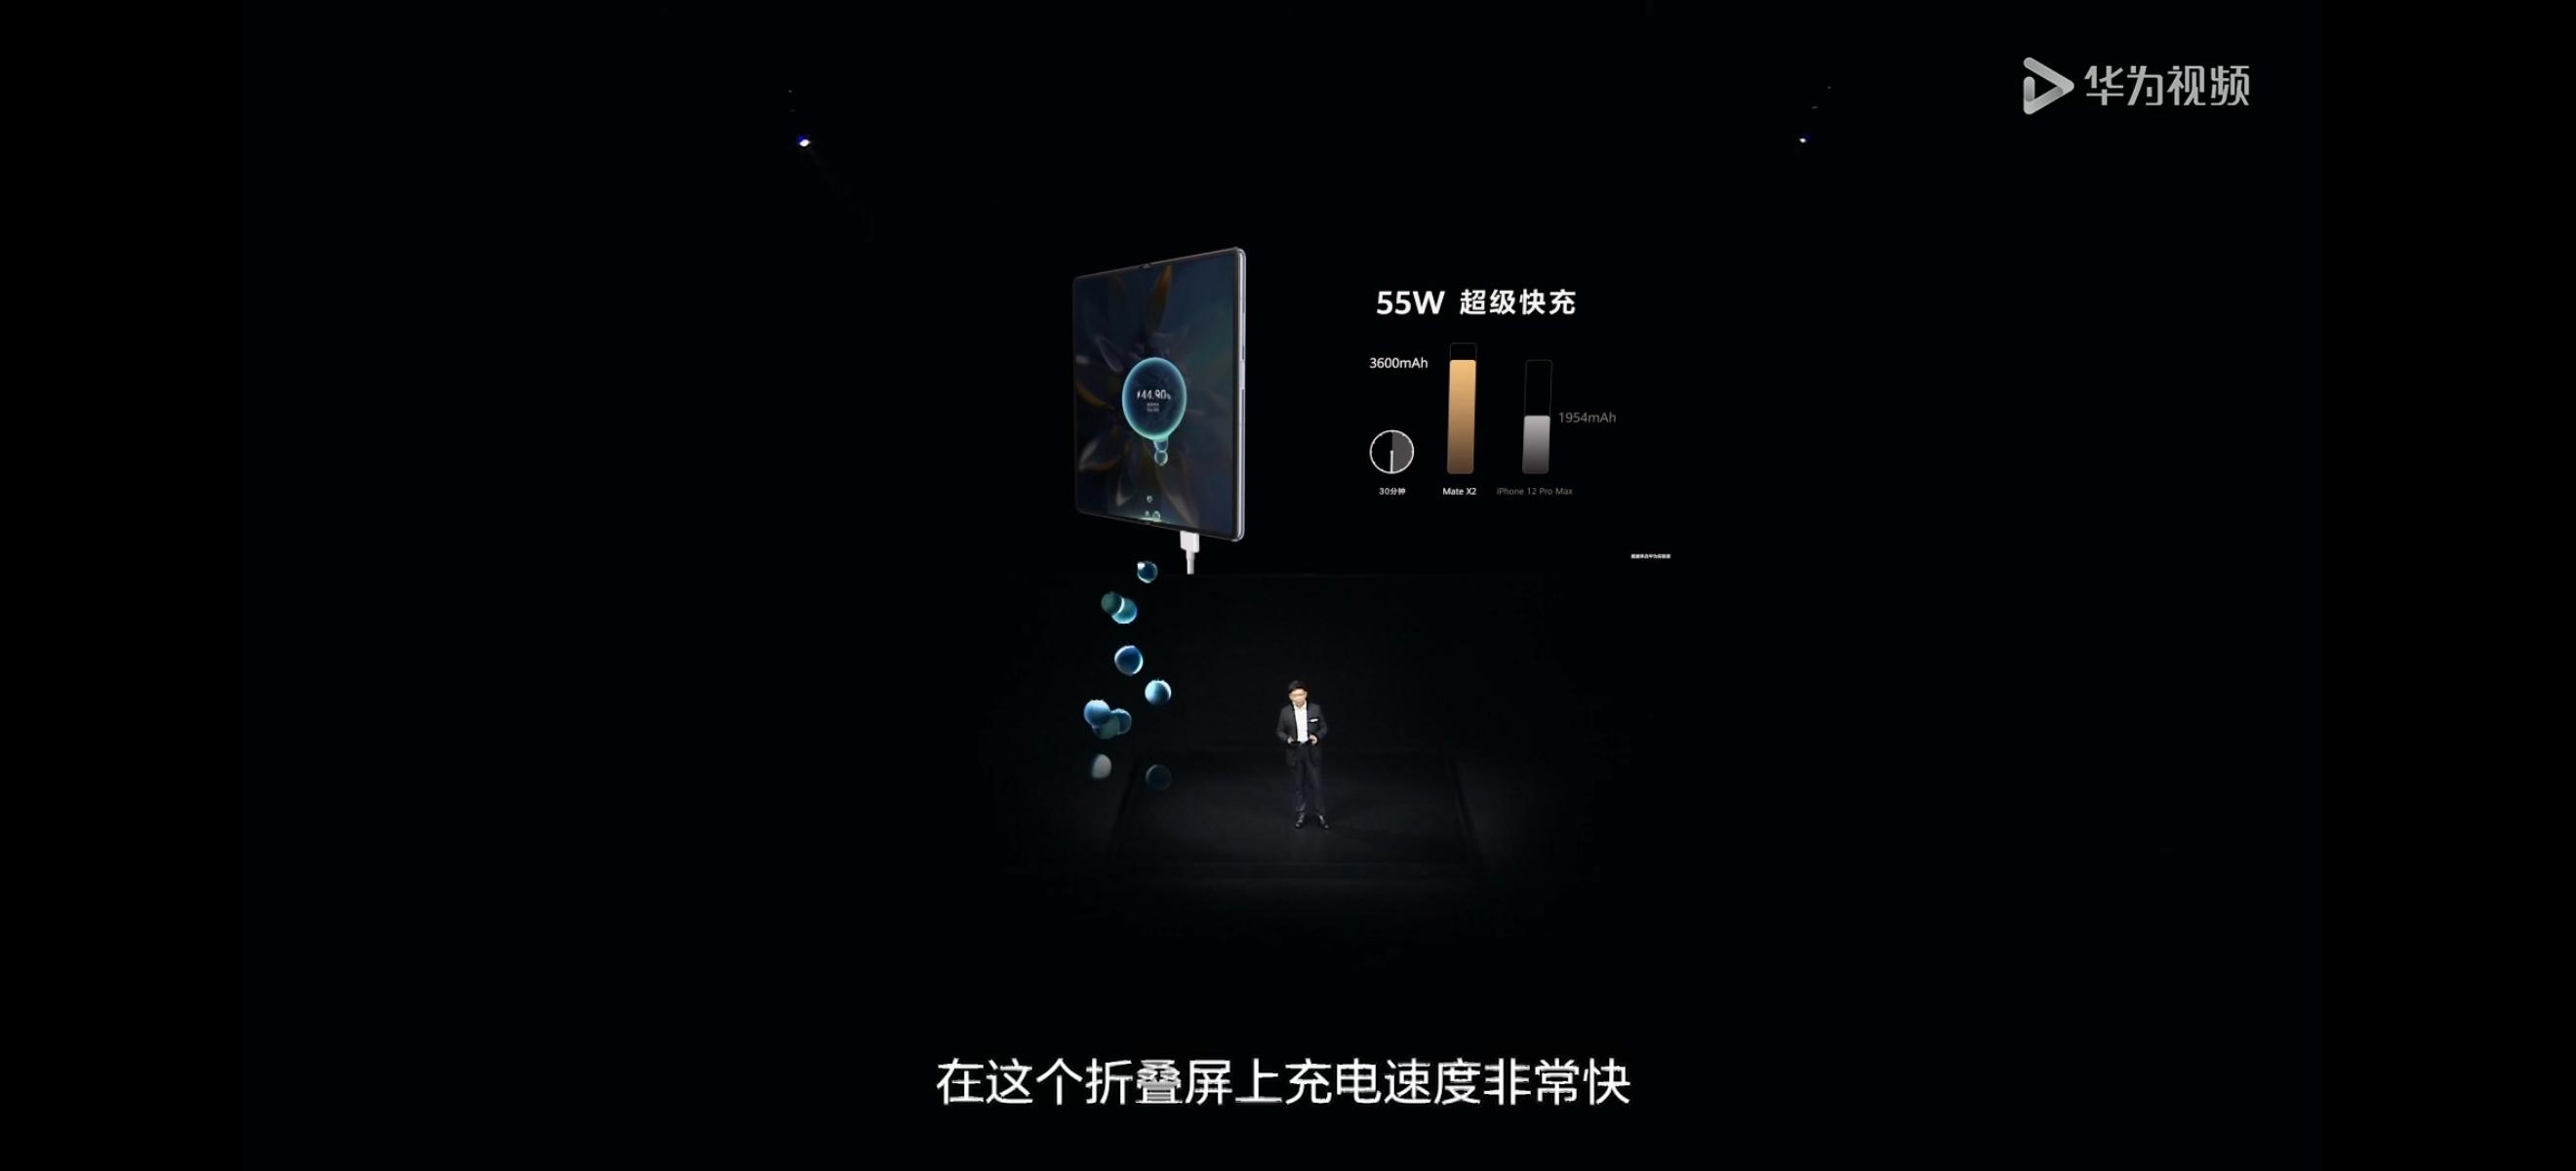 Screenshot_20210222_201640_com.huawei.himovie.jpg